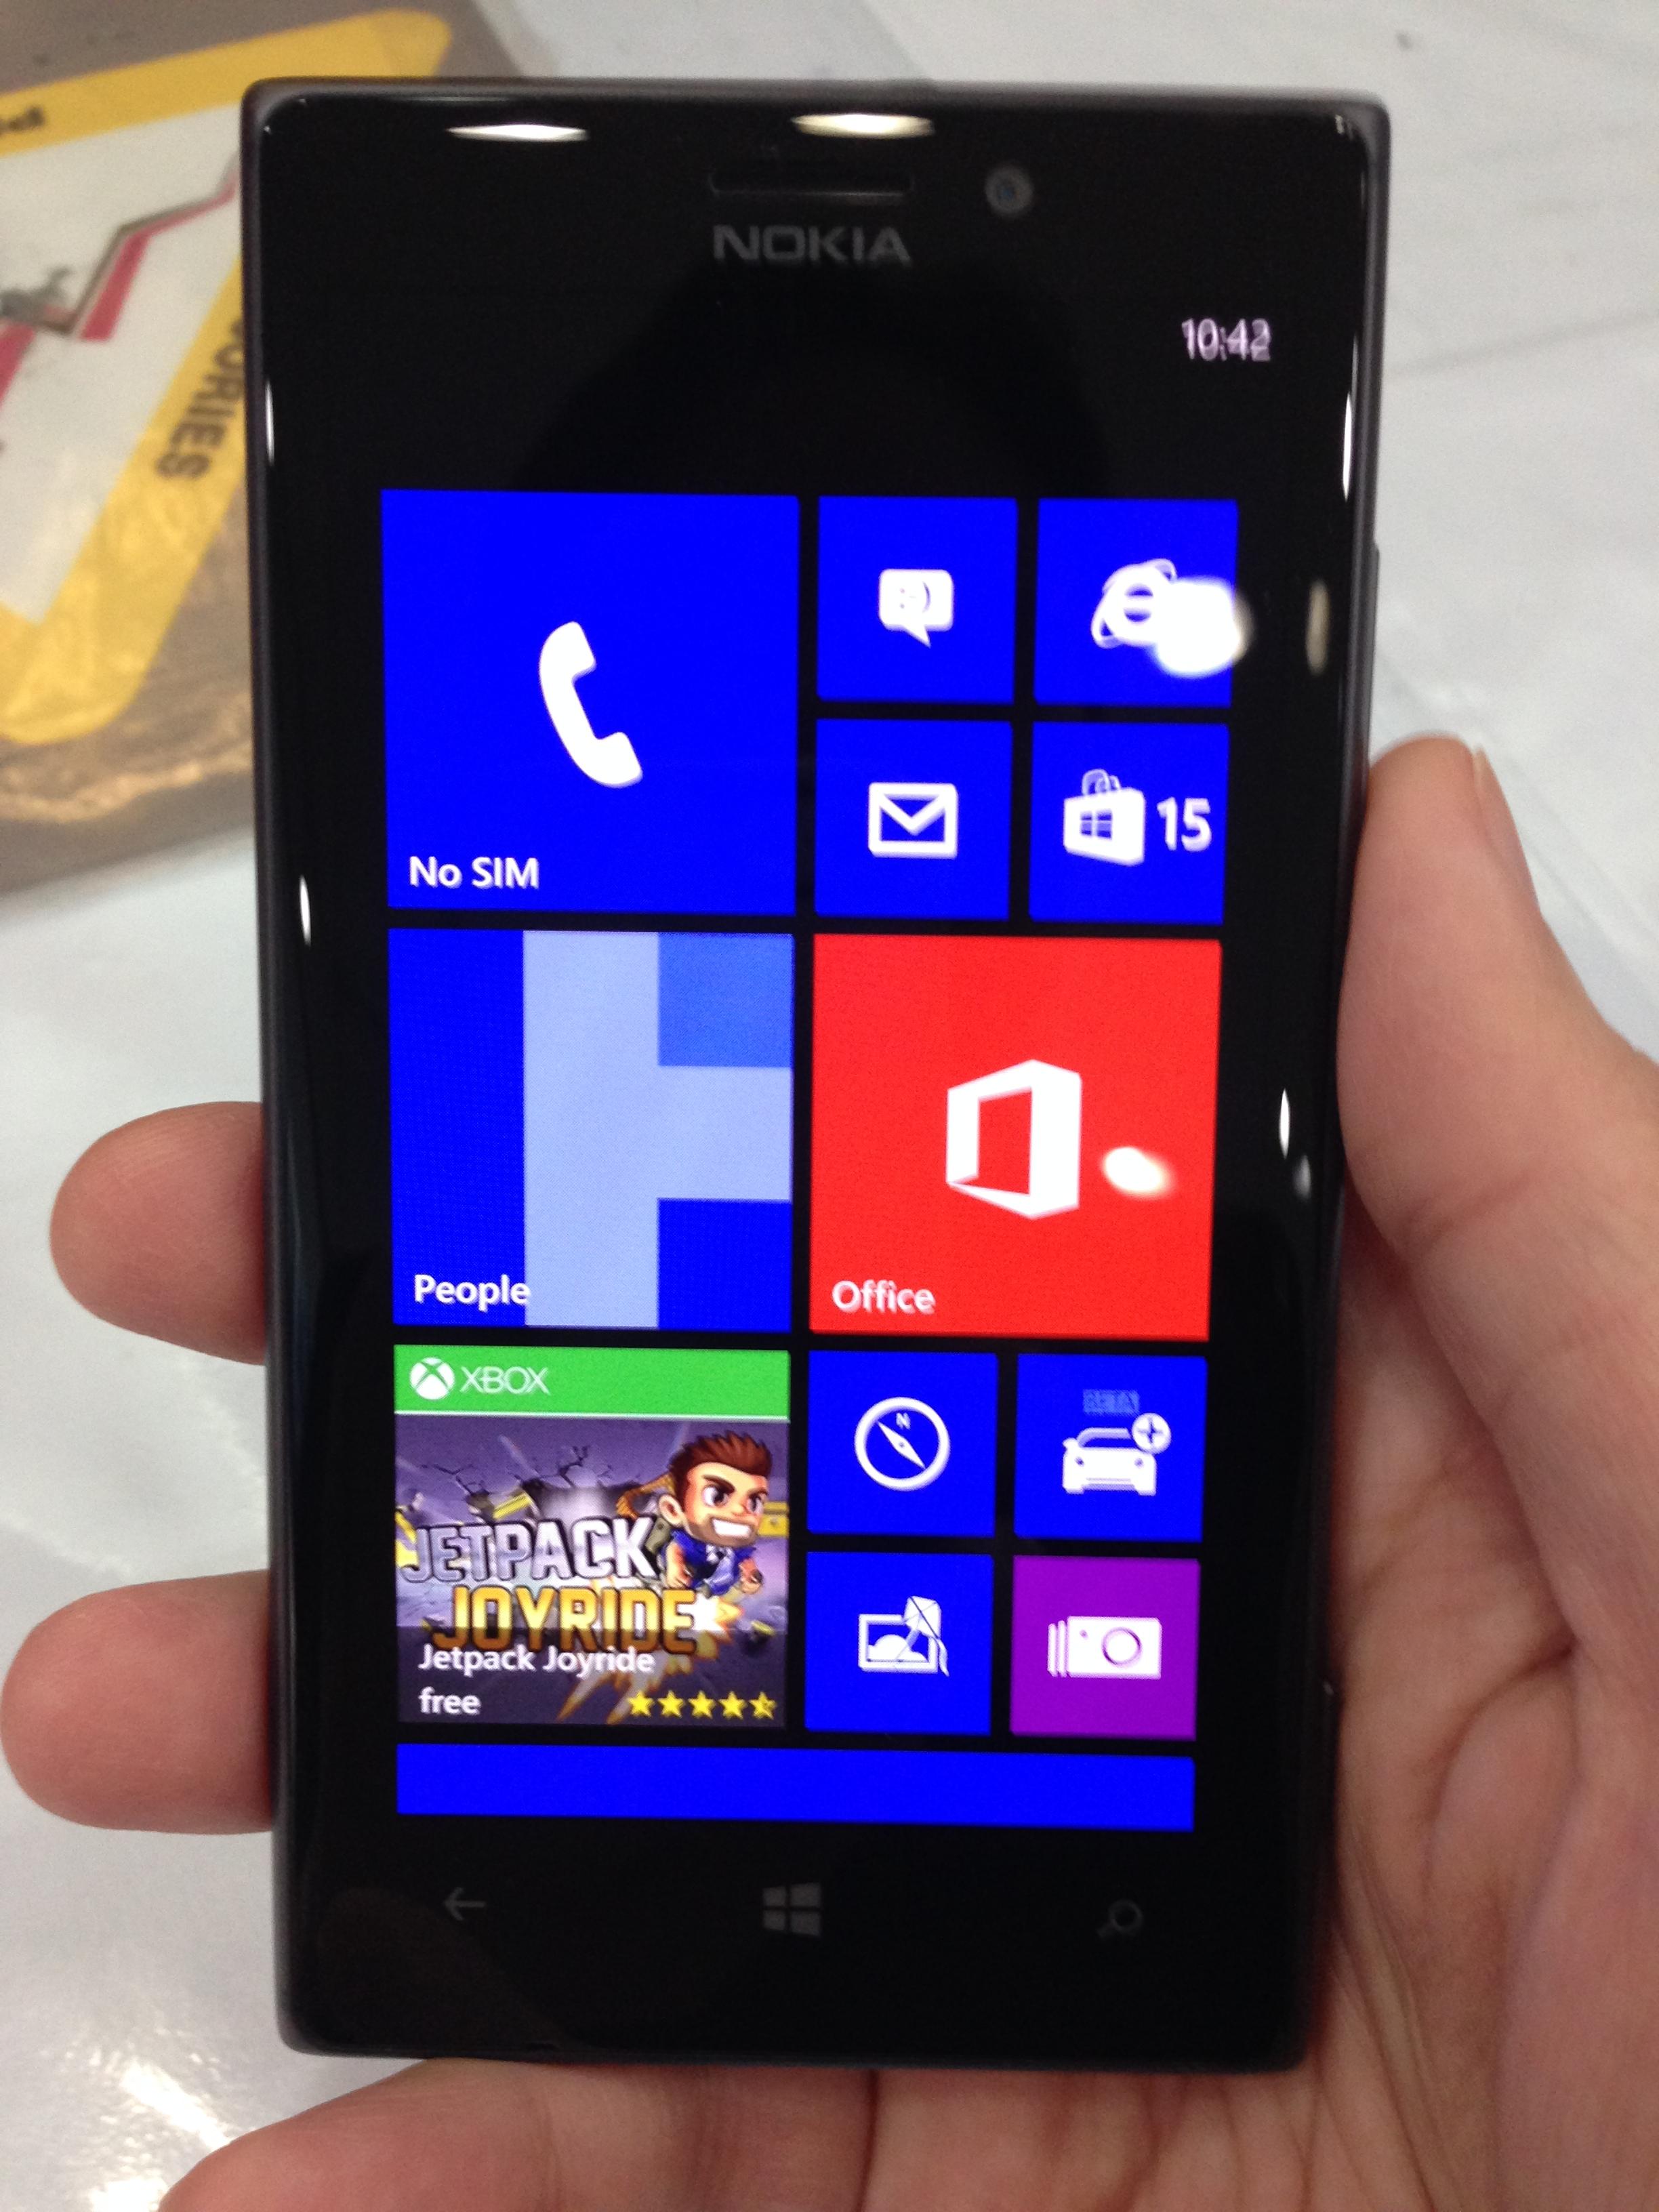 Promo Harga Nokia Lumia 925 Terbaru 2018 Police 14374js 02m Jam Tangan Pria Silver Hands On My Likes And Dislikes Filipino Tech Addict The 1020 Is Expected